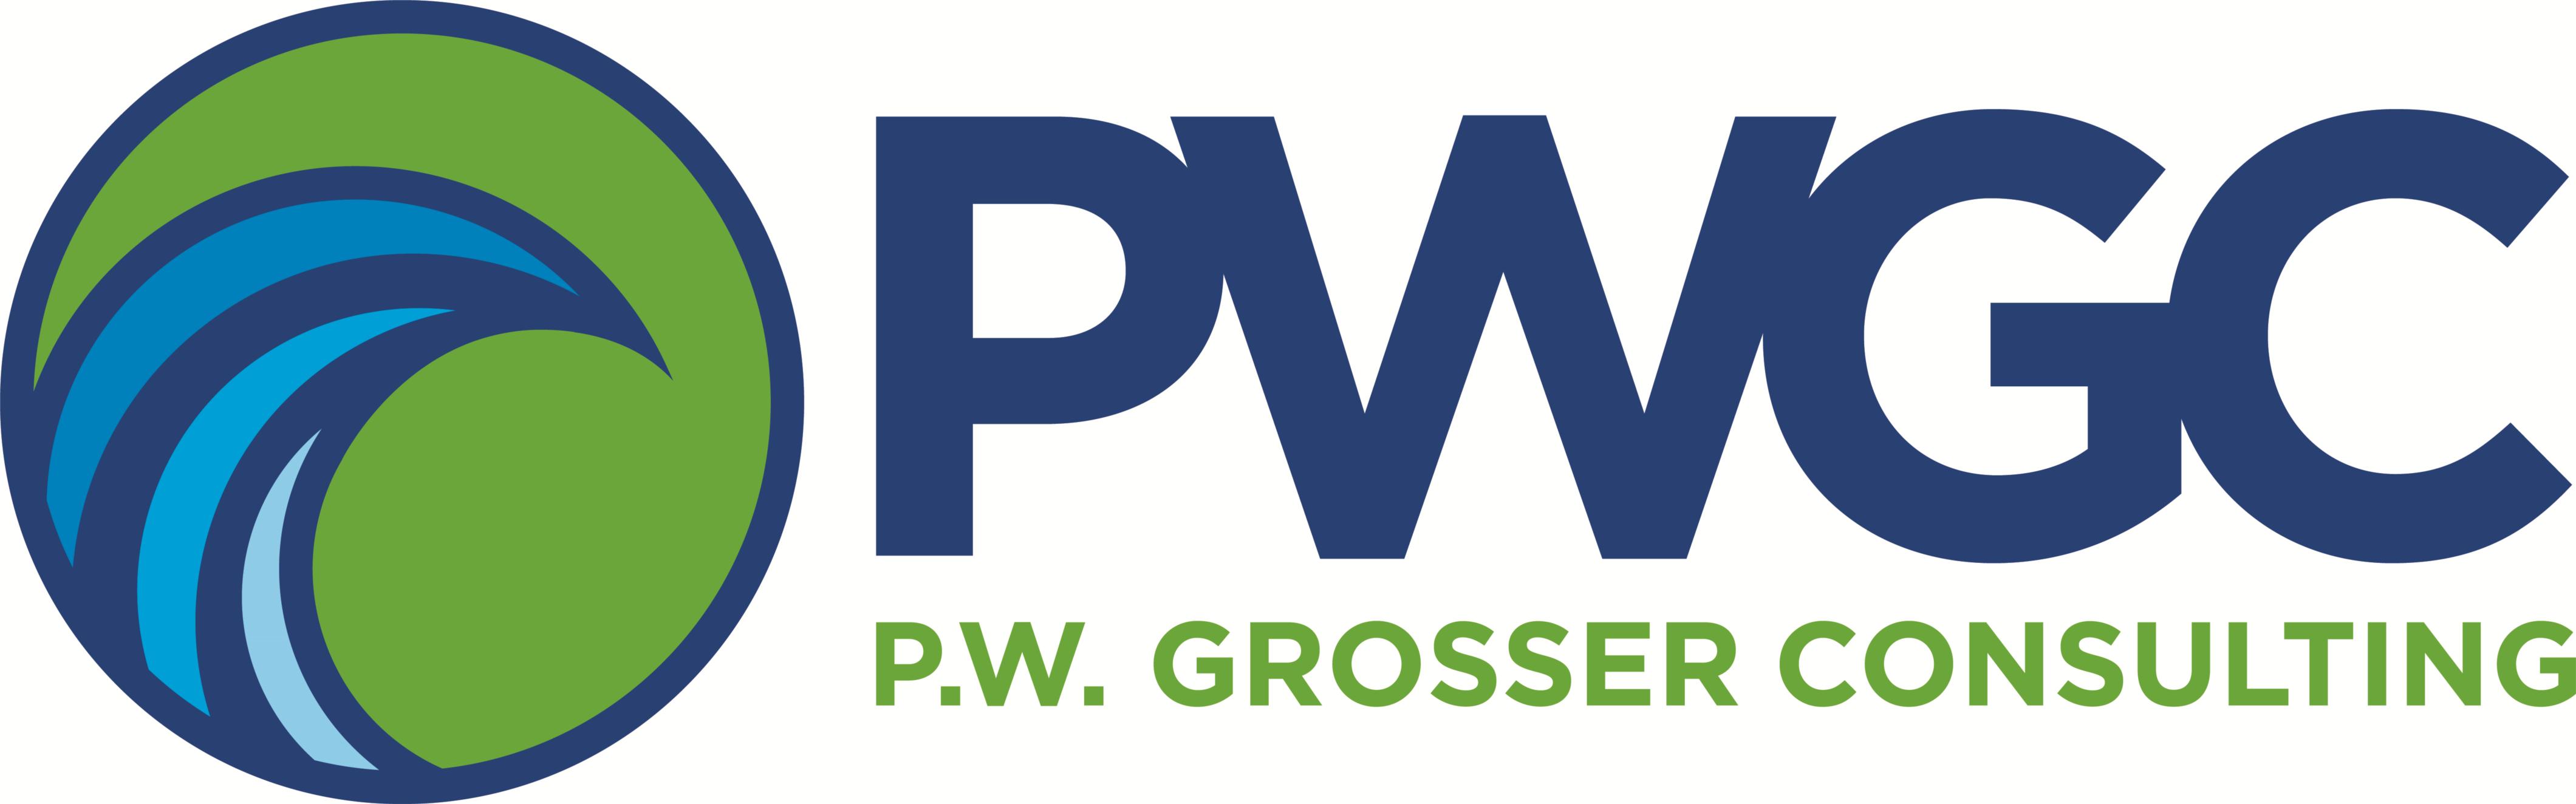 P.W. Grosser Consulting Company Logo